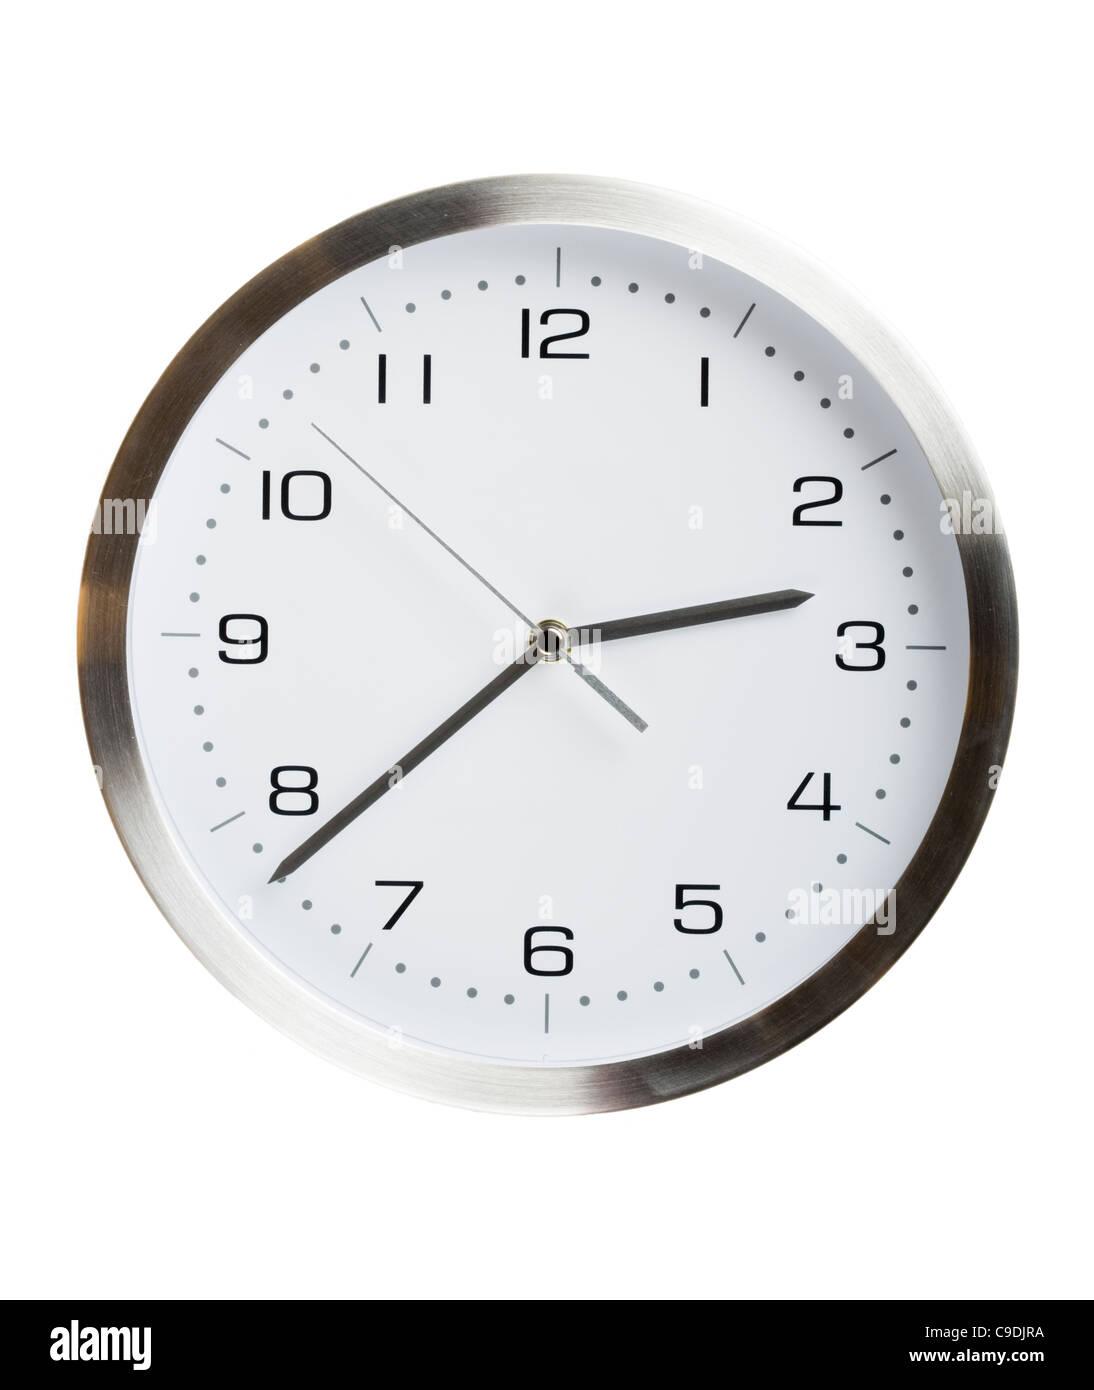 Reloj de cocina. Imagen De Stock